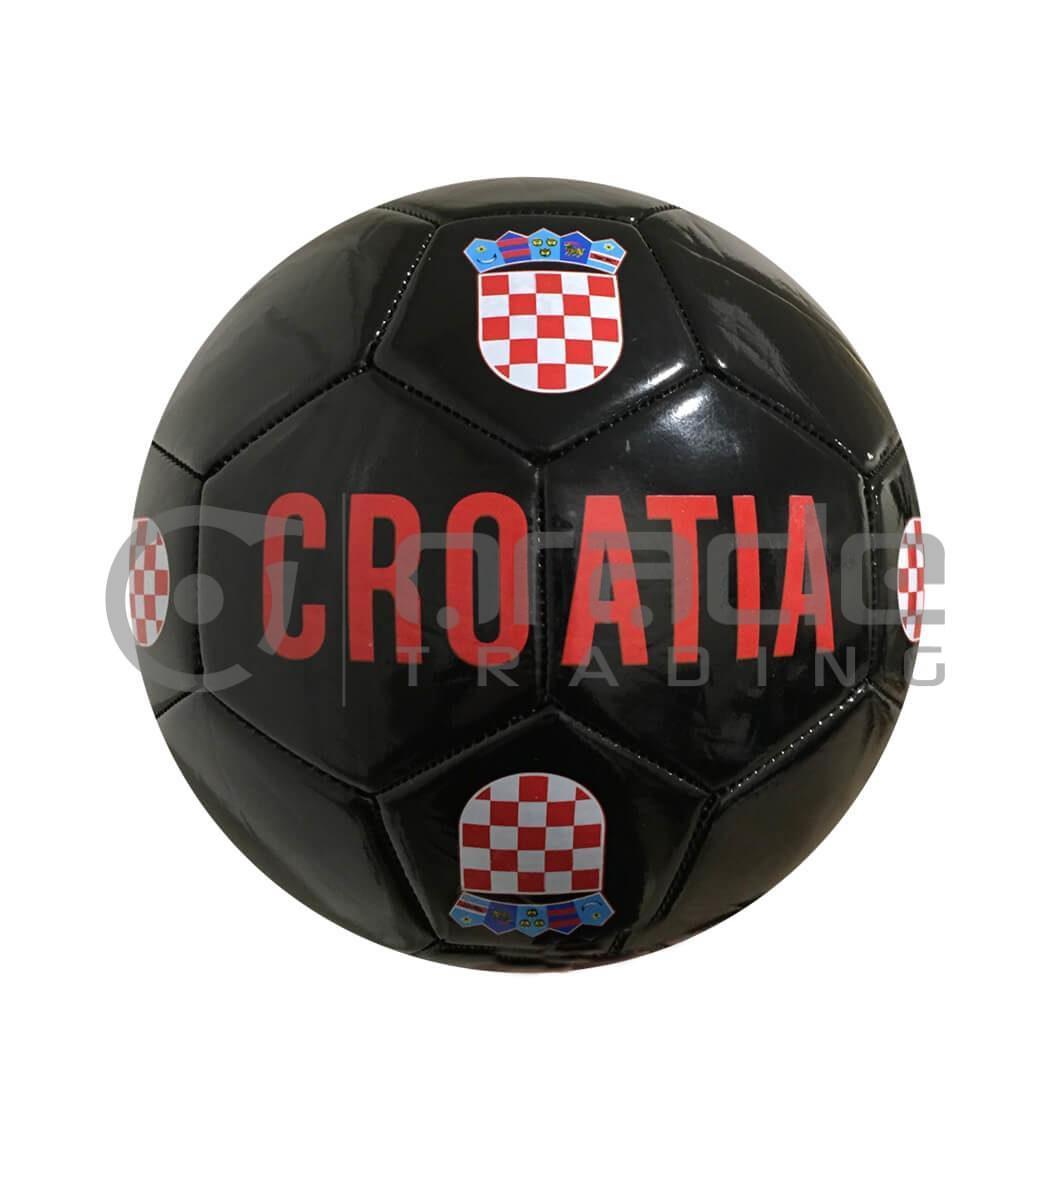 Croatia Large Soccer Ball - Black